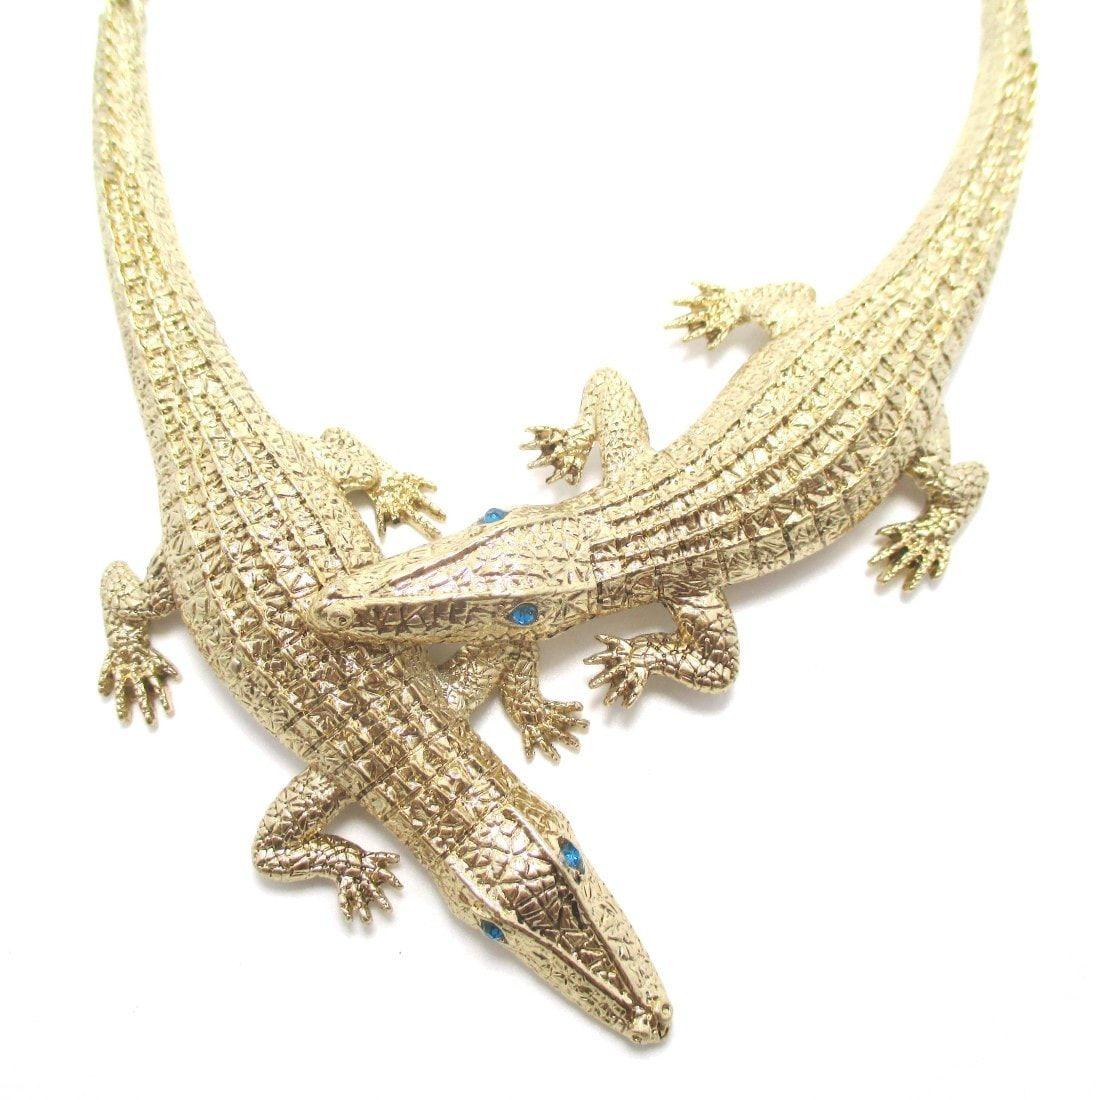 Large Alligator Crocodile Wrap Around Statement Pendant Necklace ...